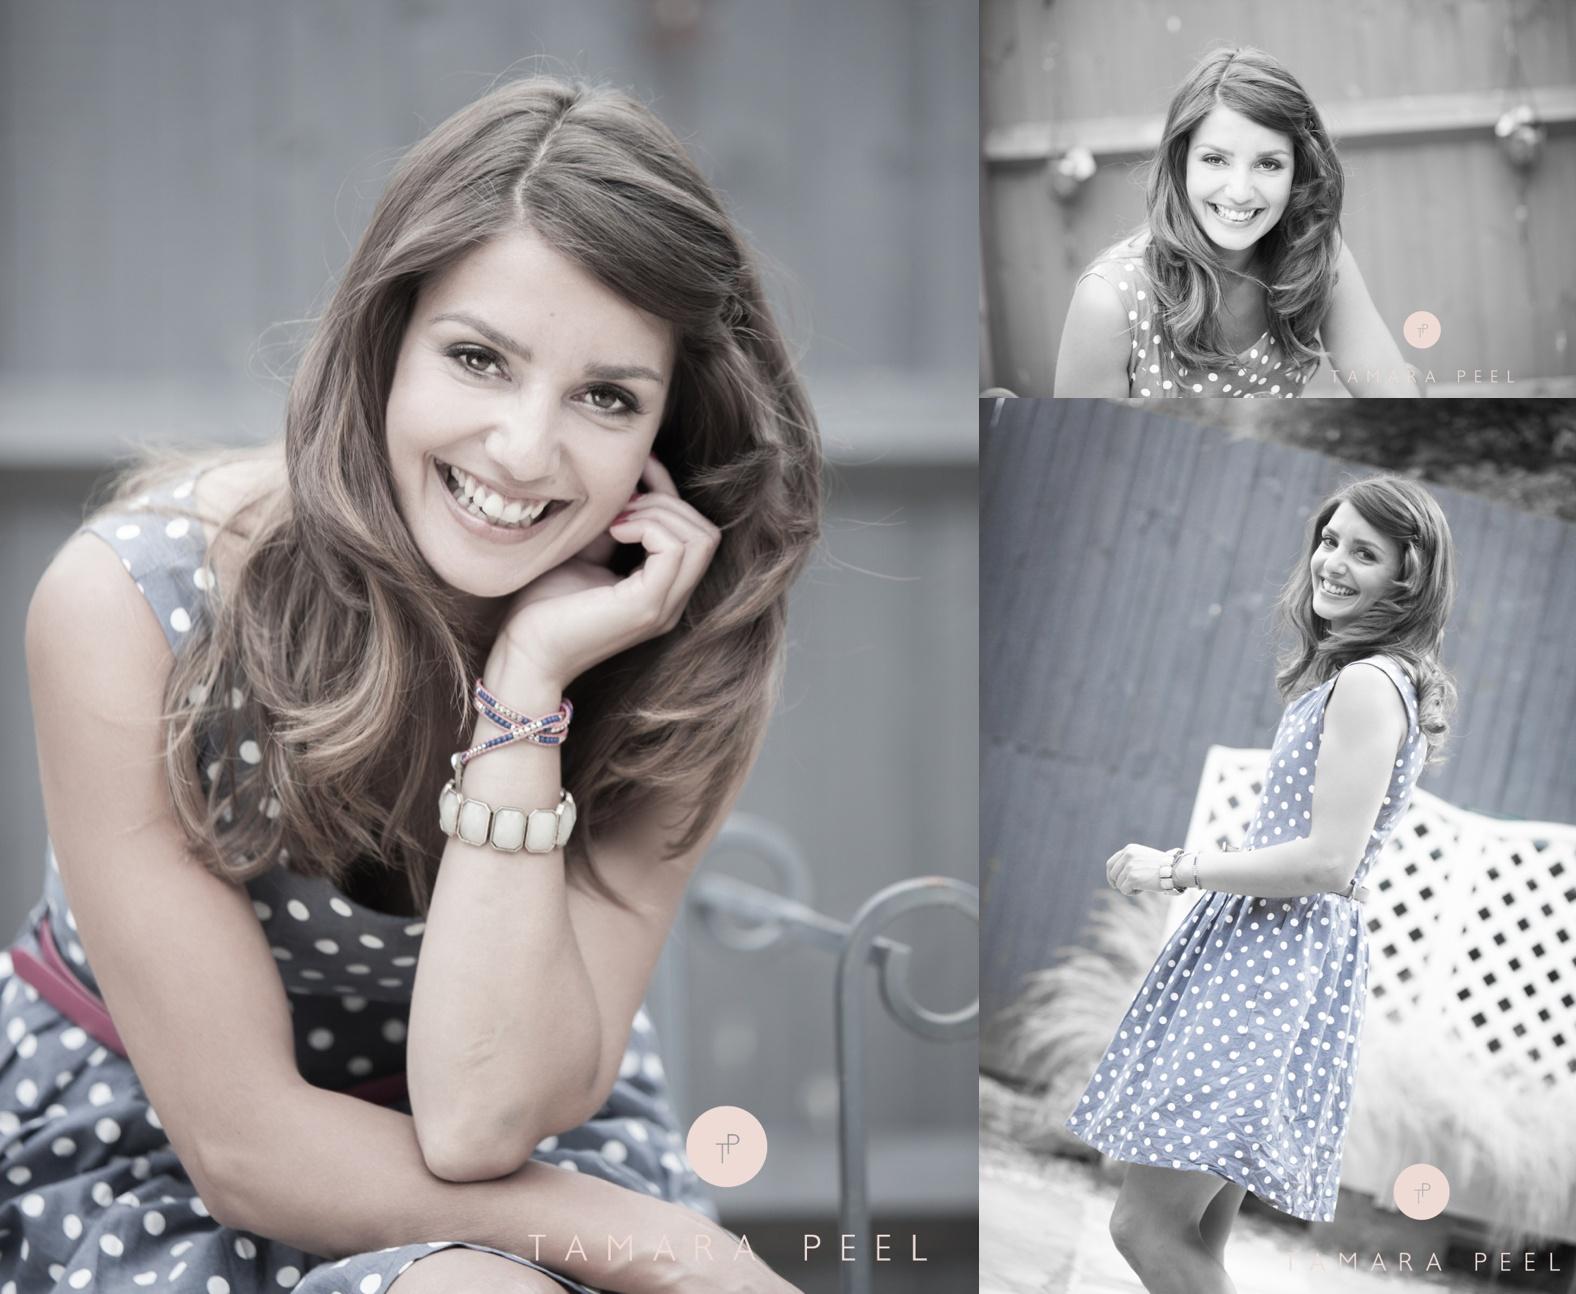 Tamara Peel. V,Macken,photographer,female_0080